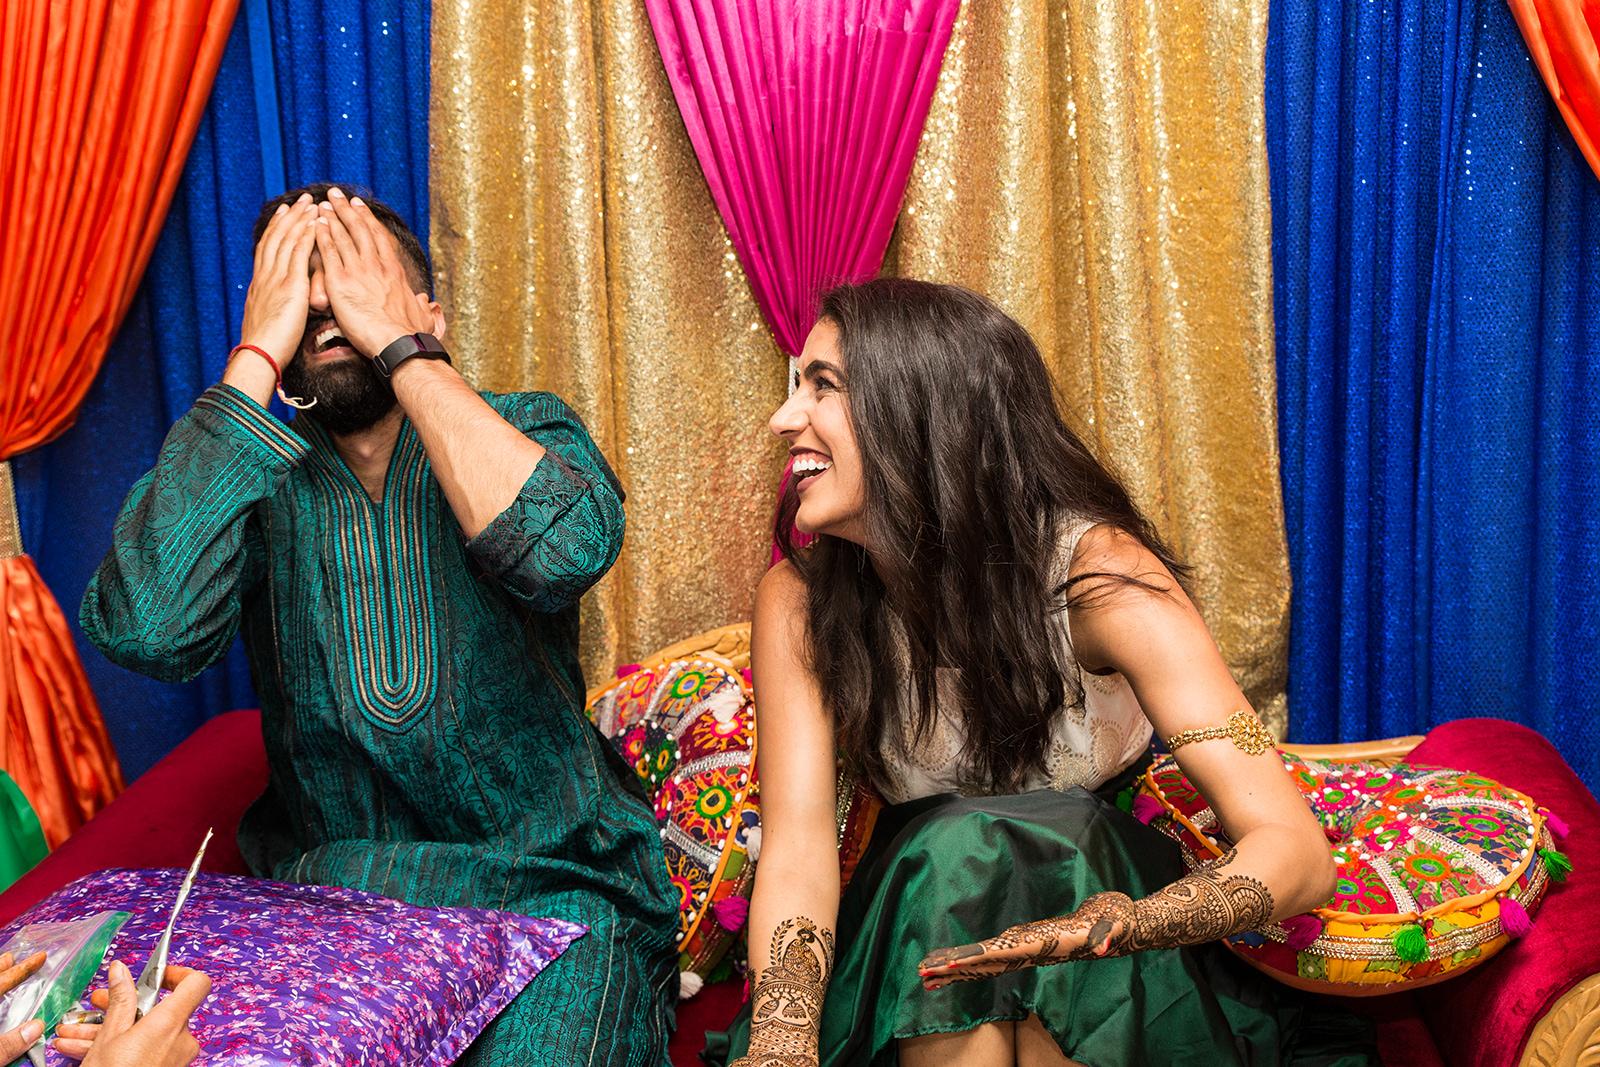 Le Cape Weddings - Sumeet and Chavi - Mendhi-29.jpg